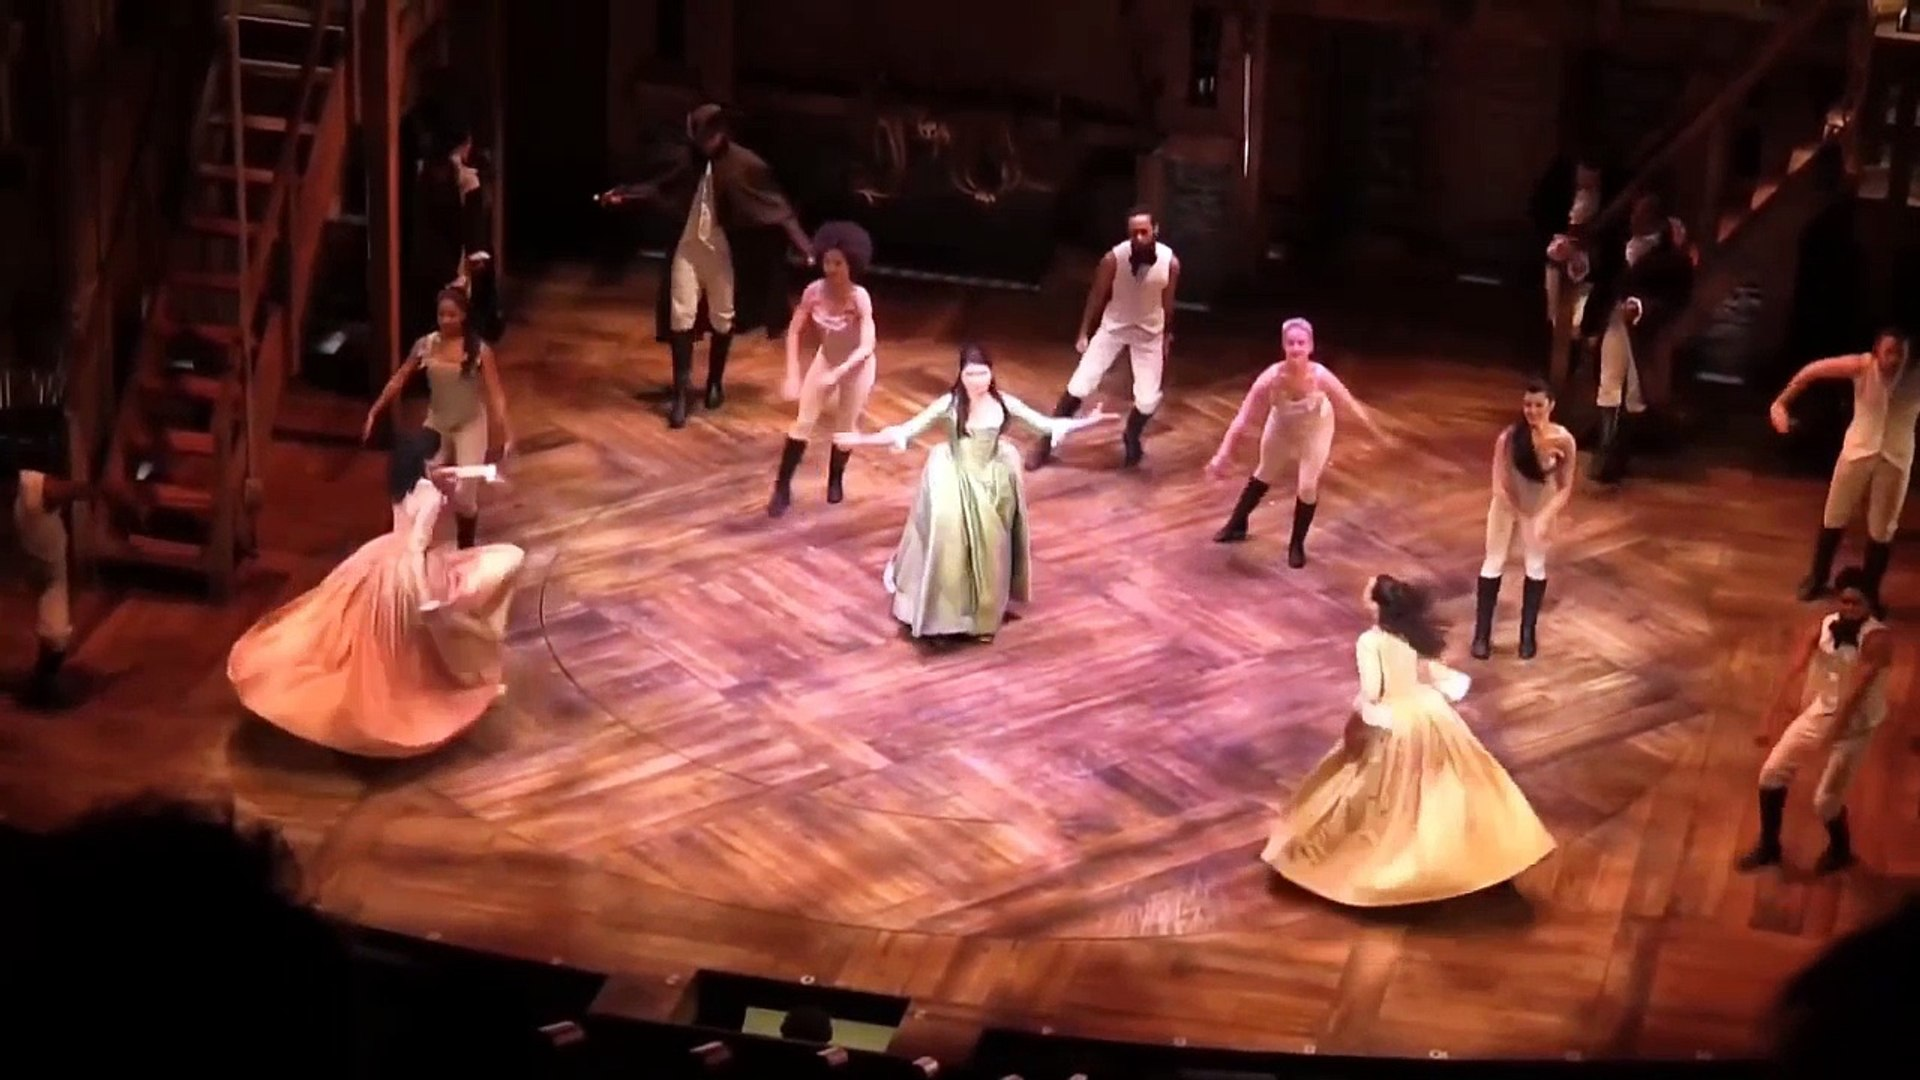 Hamilton full musical ACT 1 - Part 1